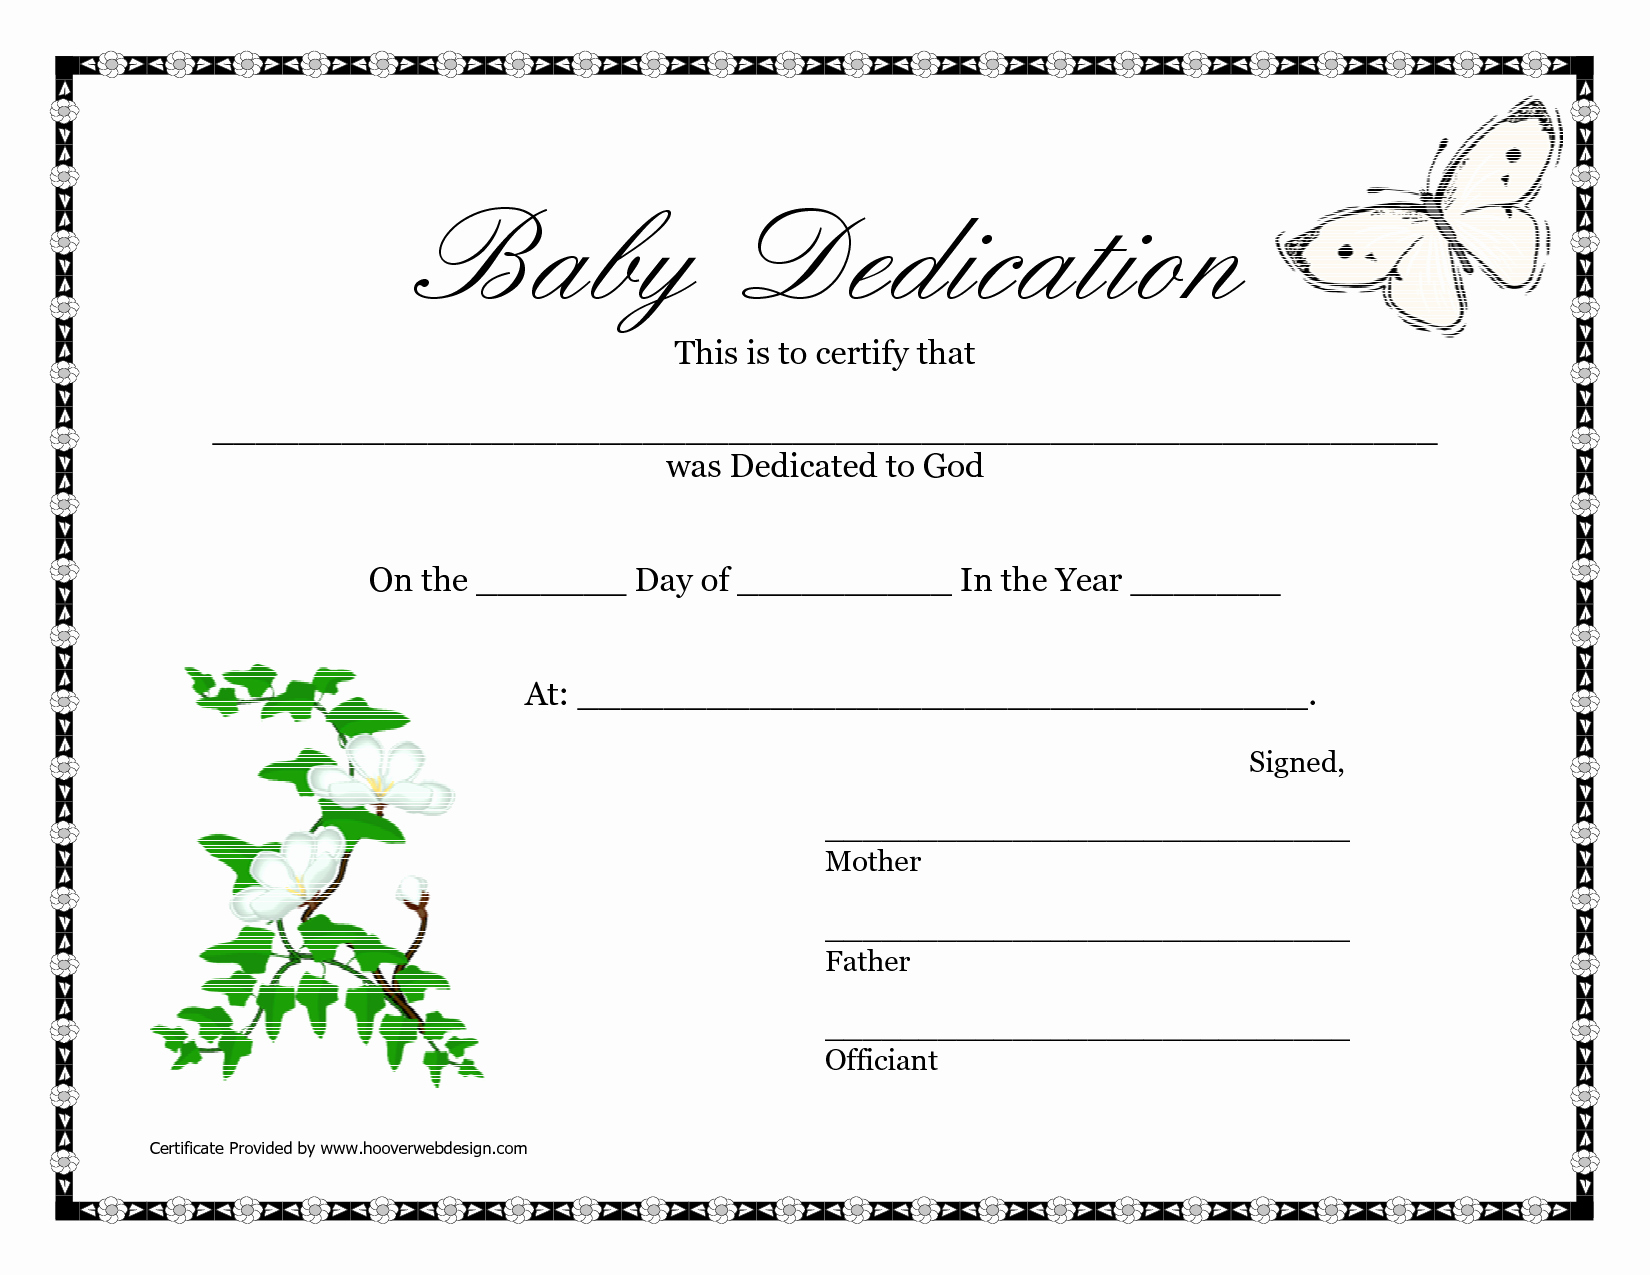 Child Dedication Certificate Template Inspirational Best S Of Baby Certificate Template Free Printable